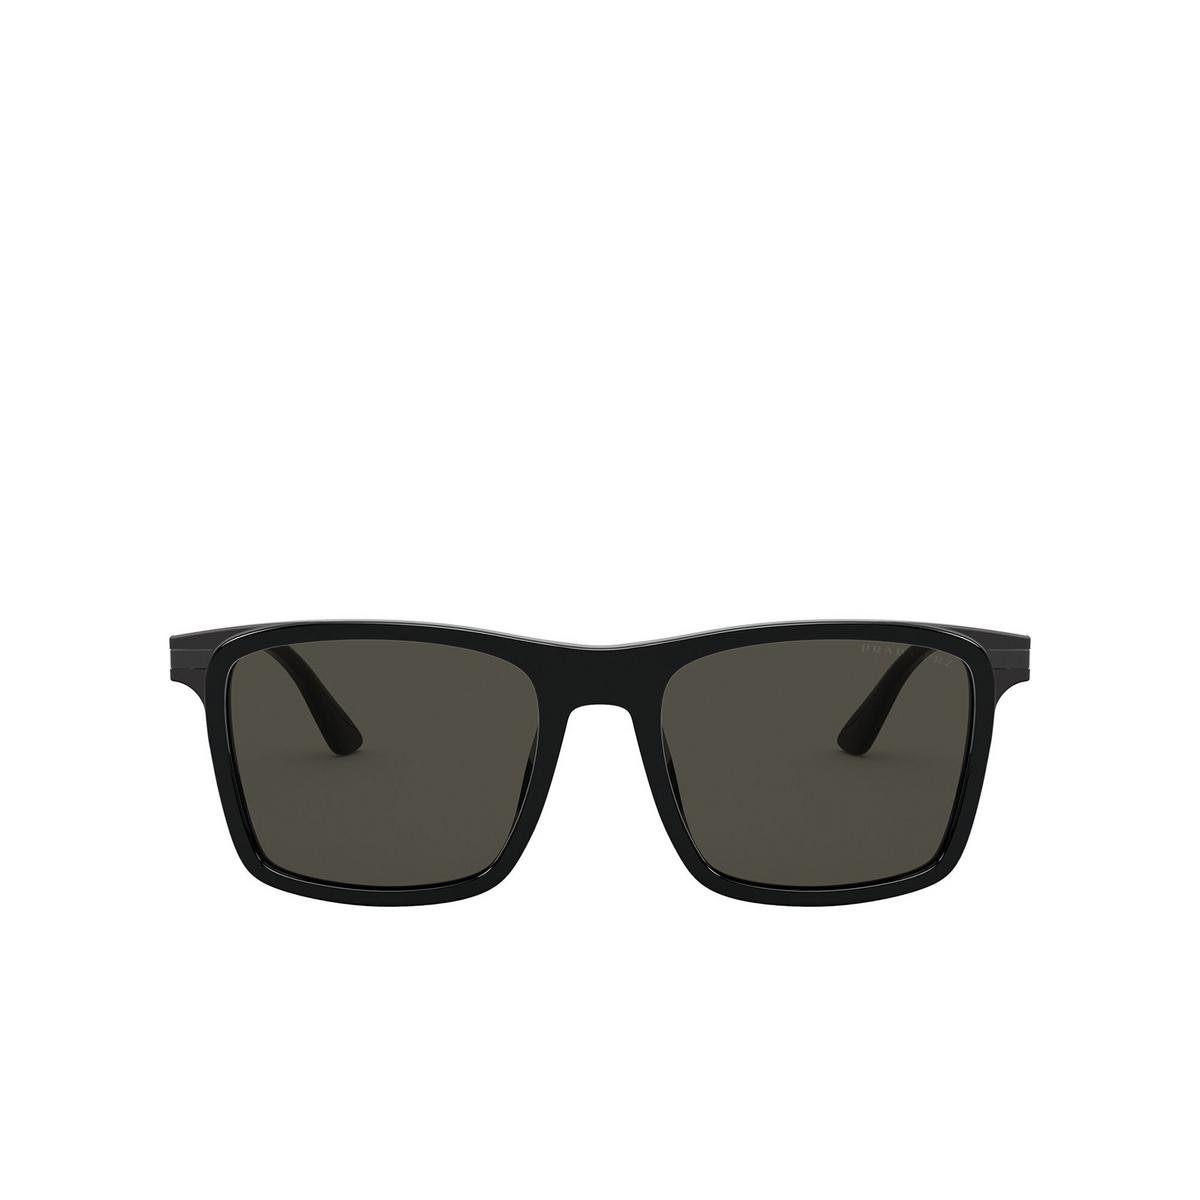 Prada® Square Sunglasses: PR 19XS color Black 07F08G - front view.